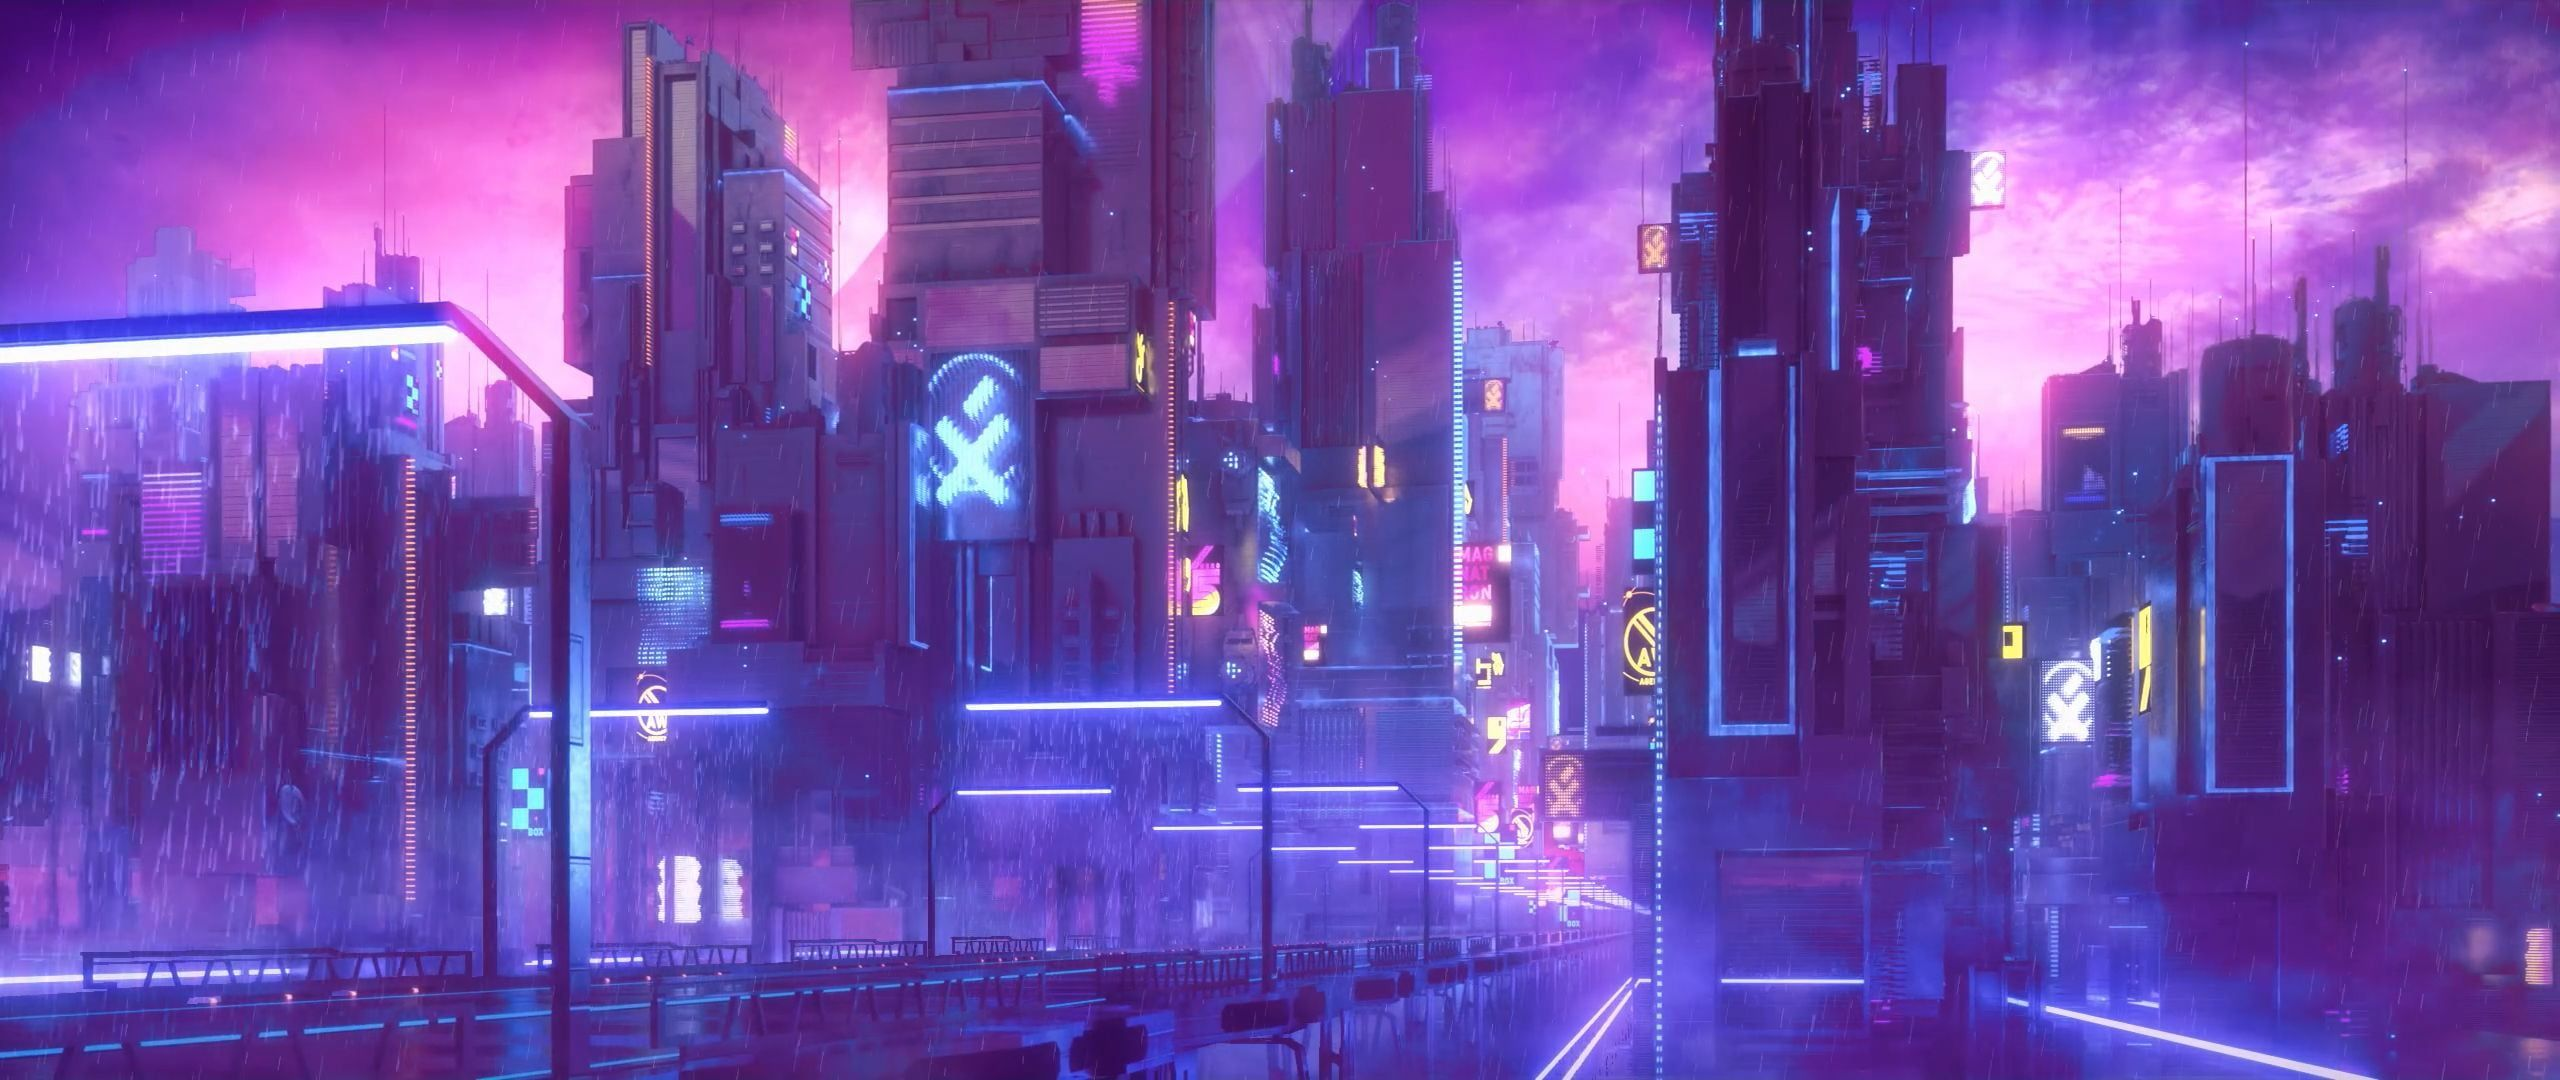 City Animated Digital Wallpaper Cyberpunk Neon 2k Wallpaper Hdwallpaper Desktop Neon Wallpaper Digital Wallpaper City Wallpaper